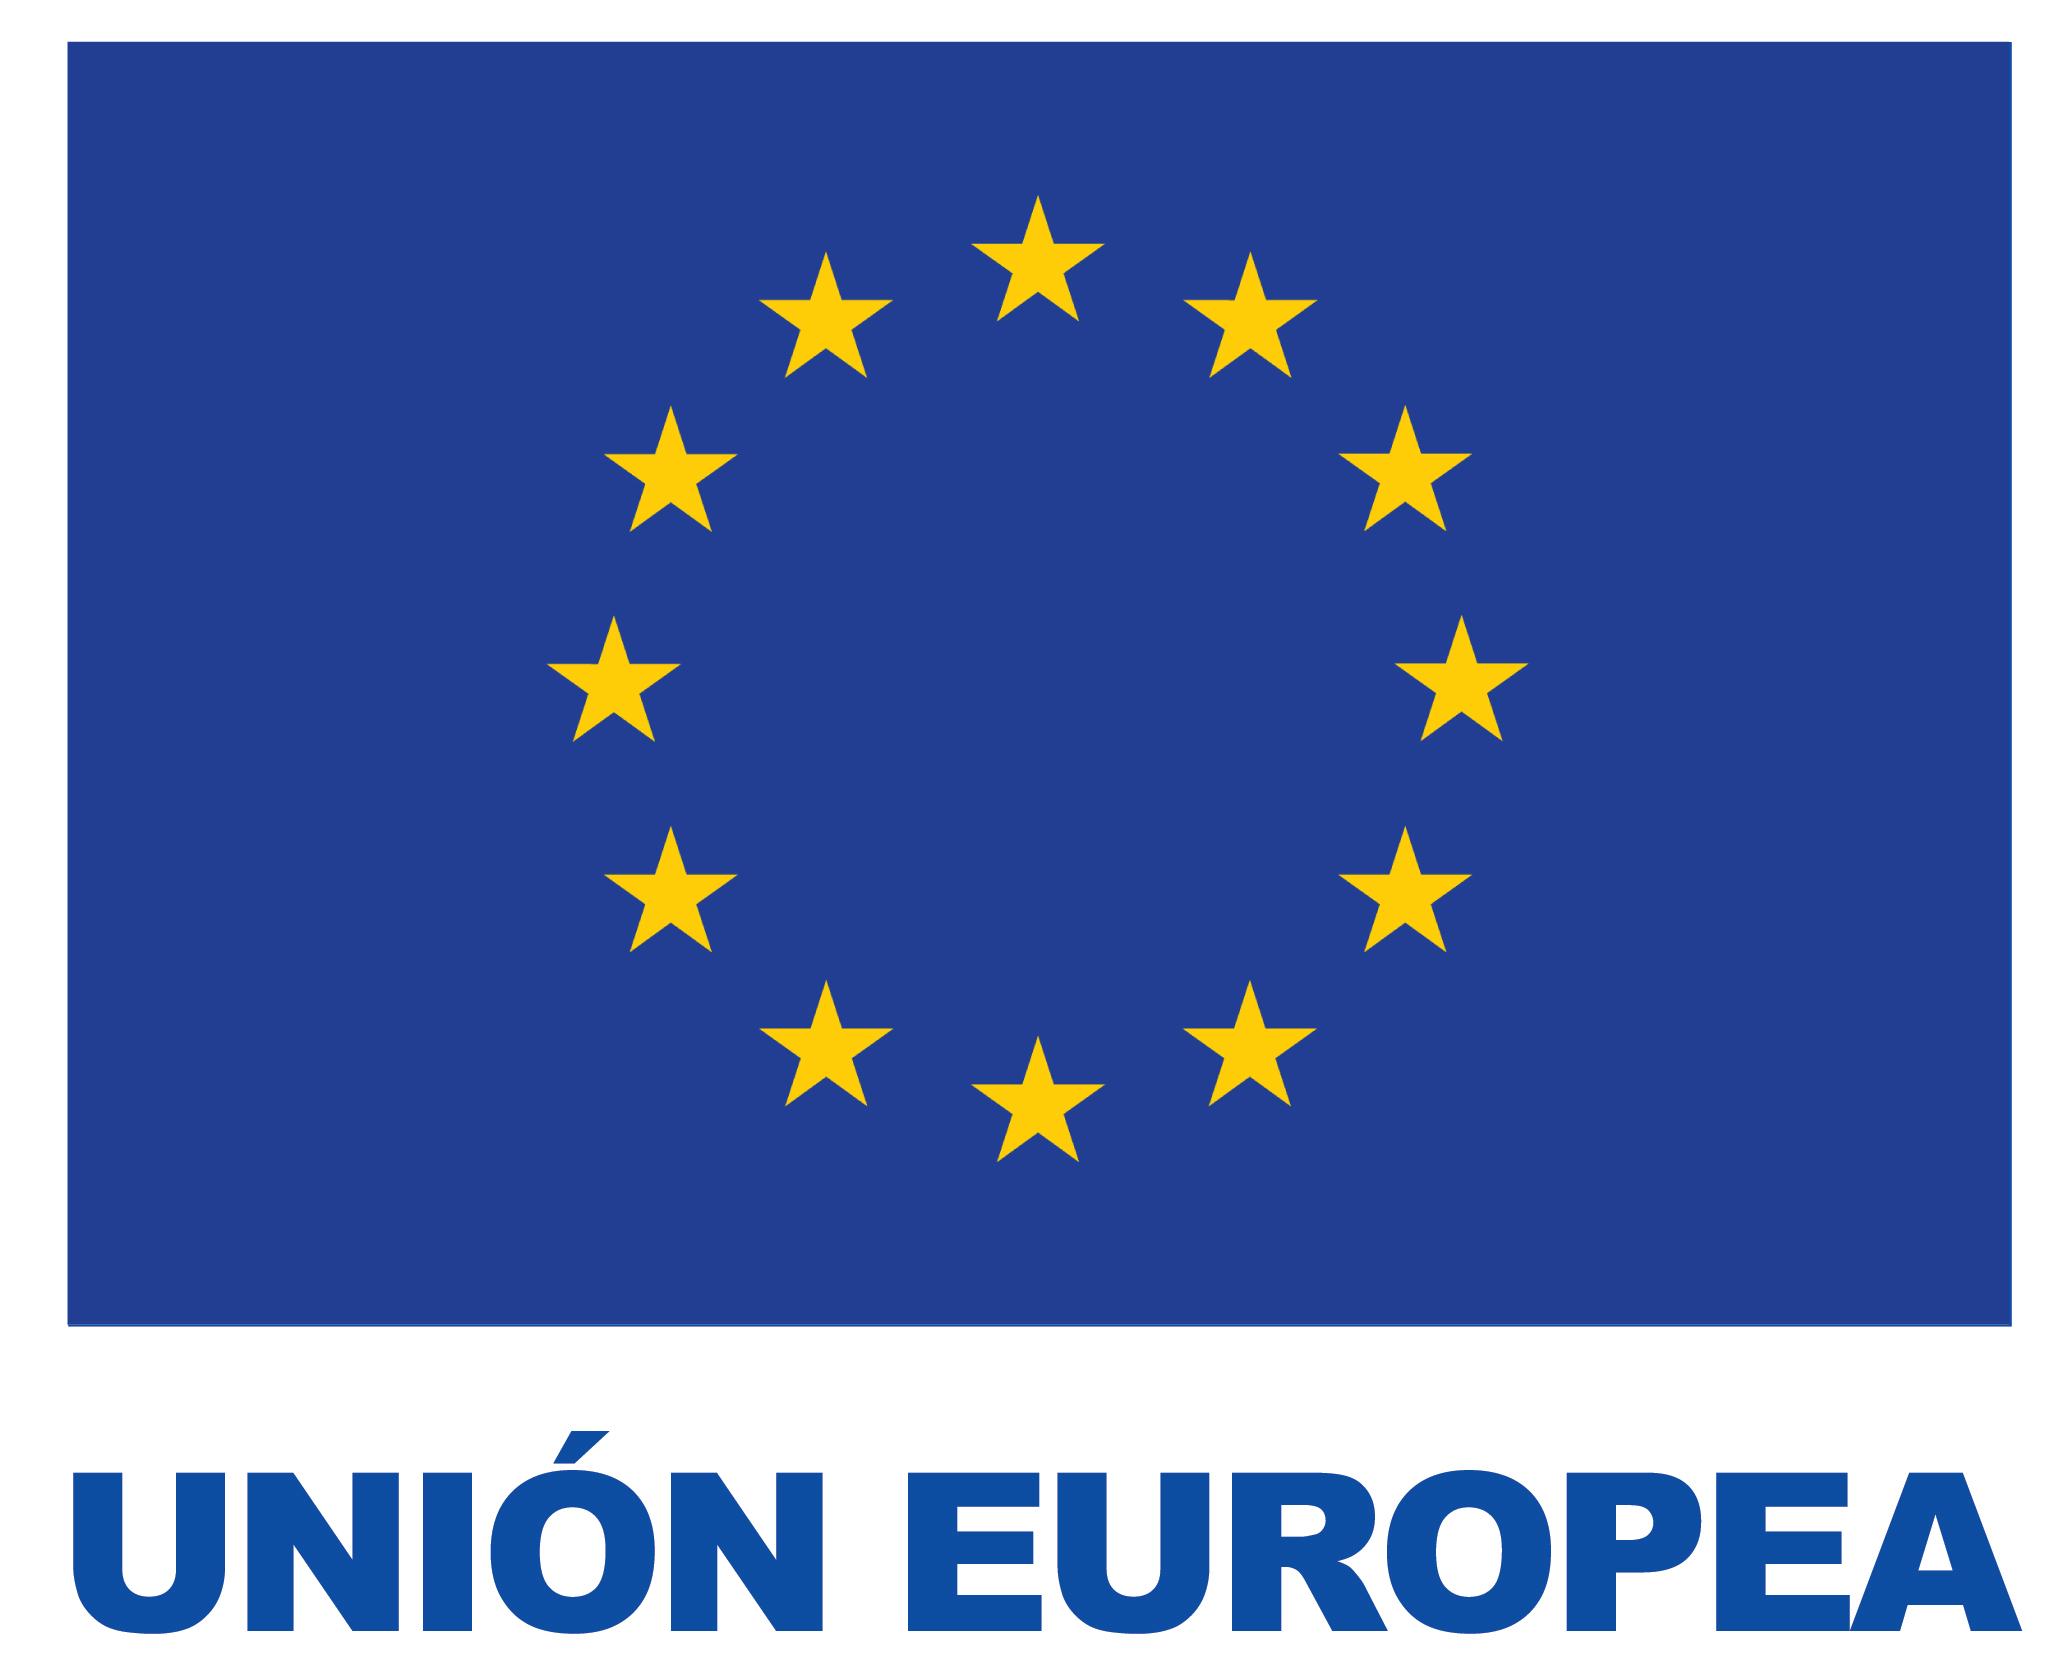 Unión Europea - TiétarTeVe